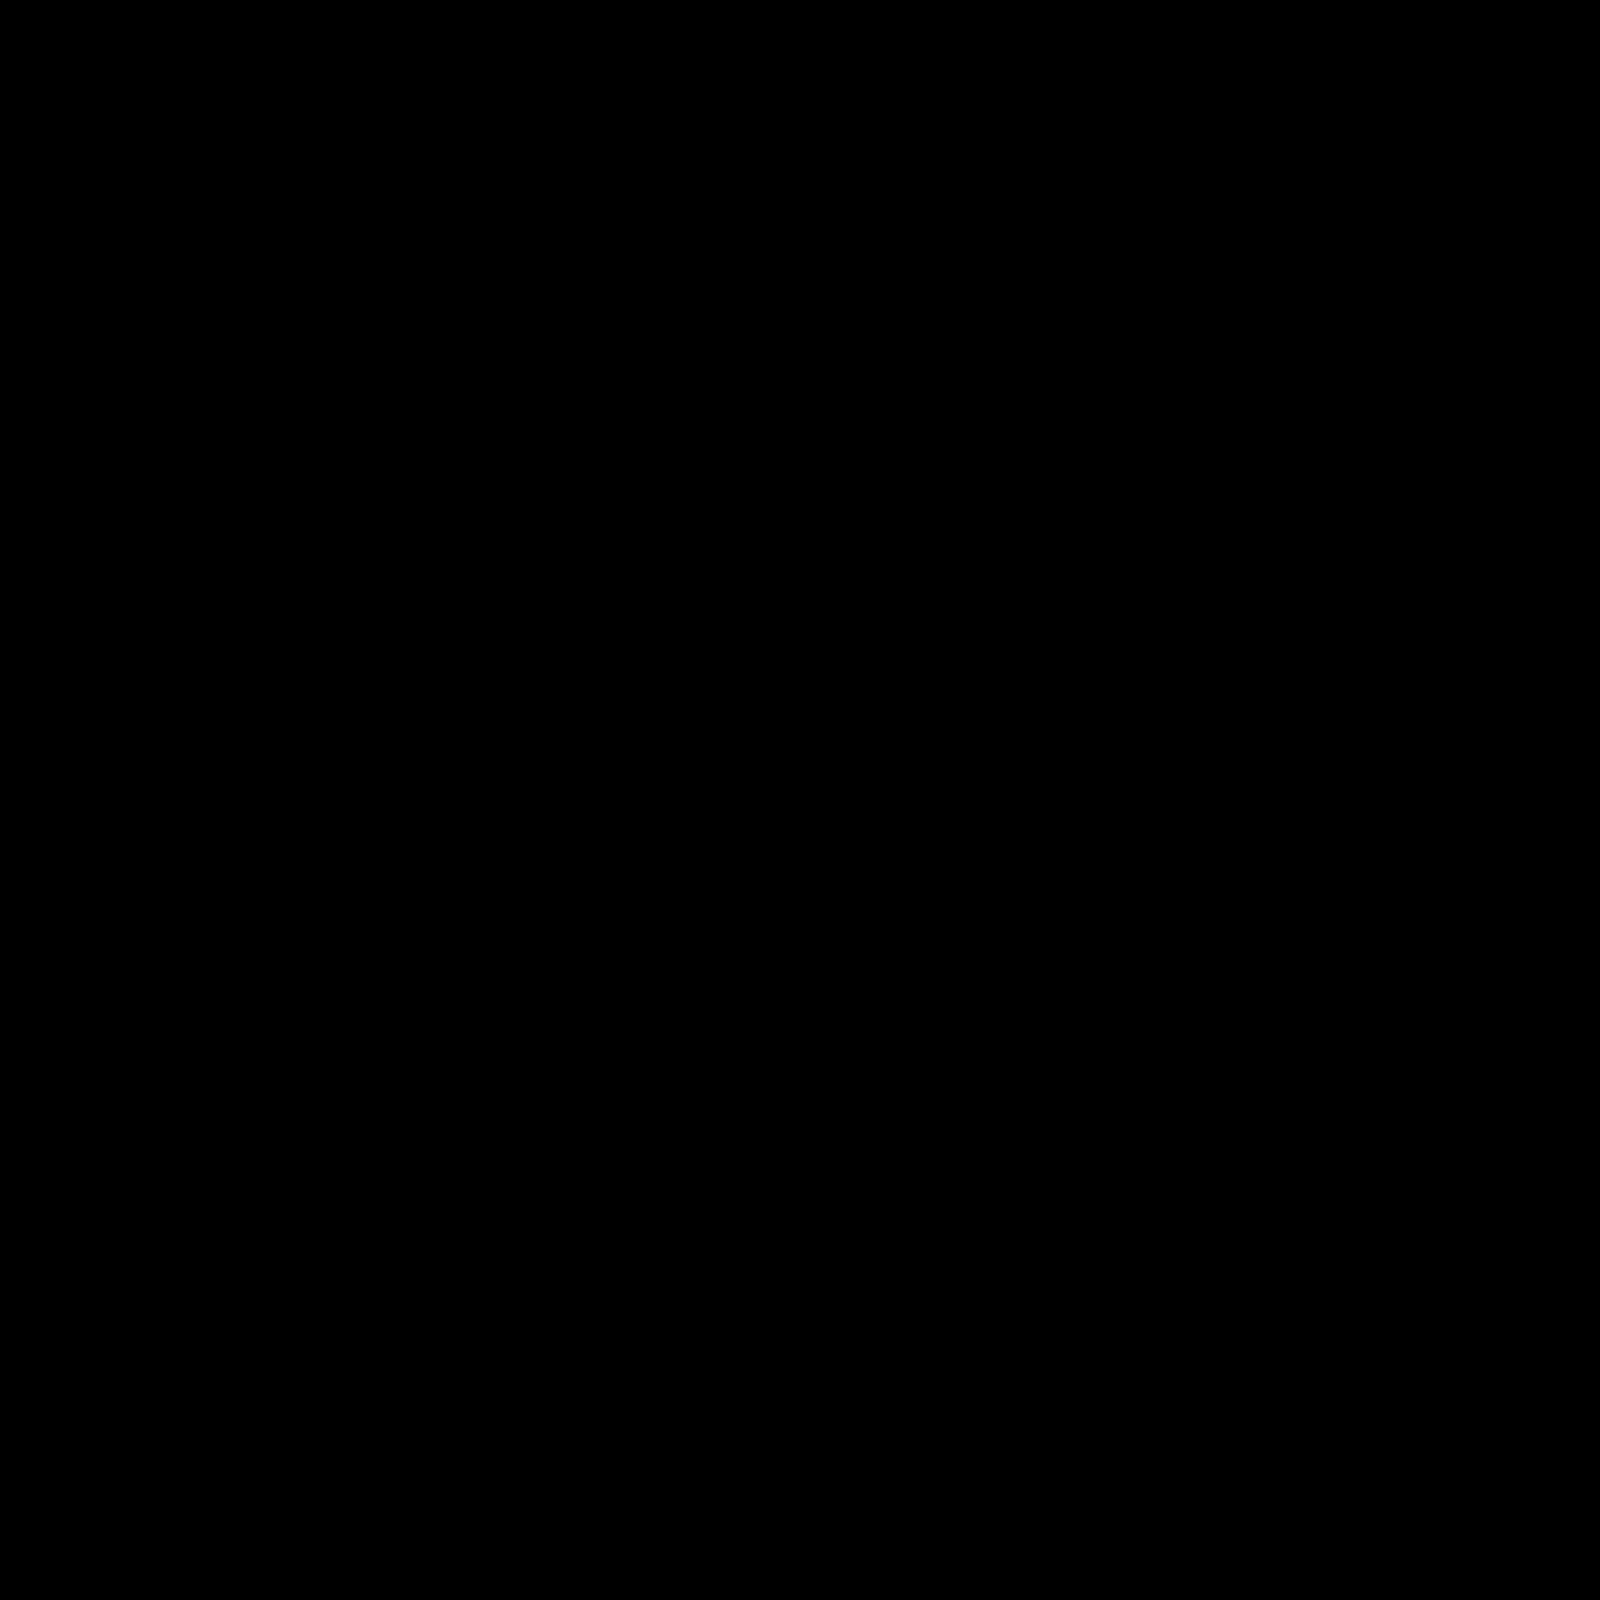 Hiragana a Filled icon